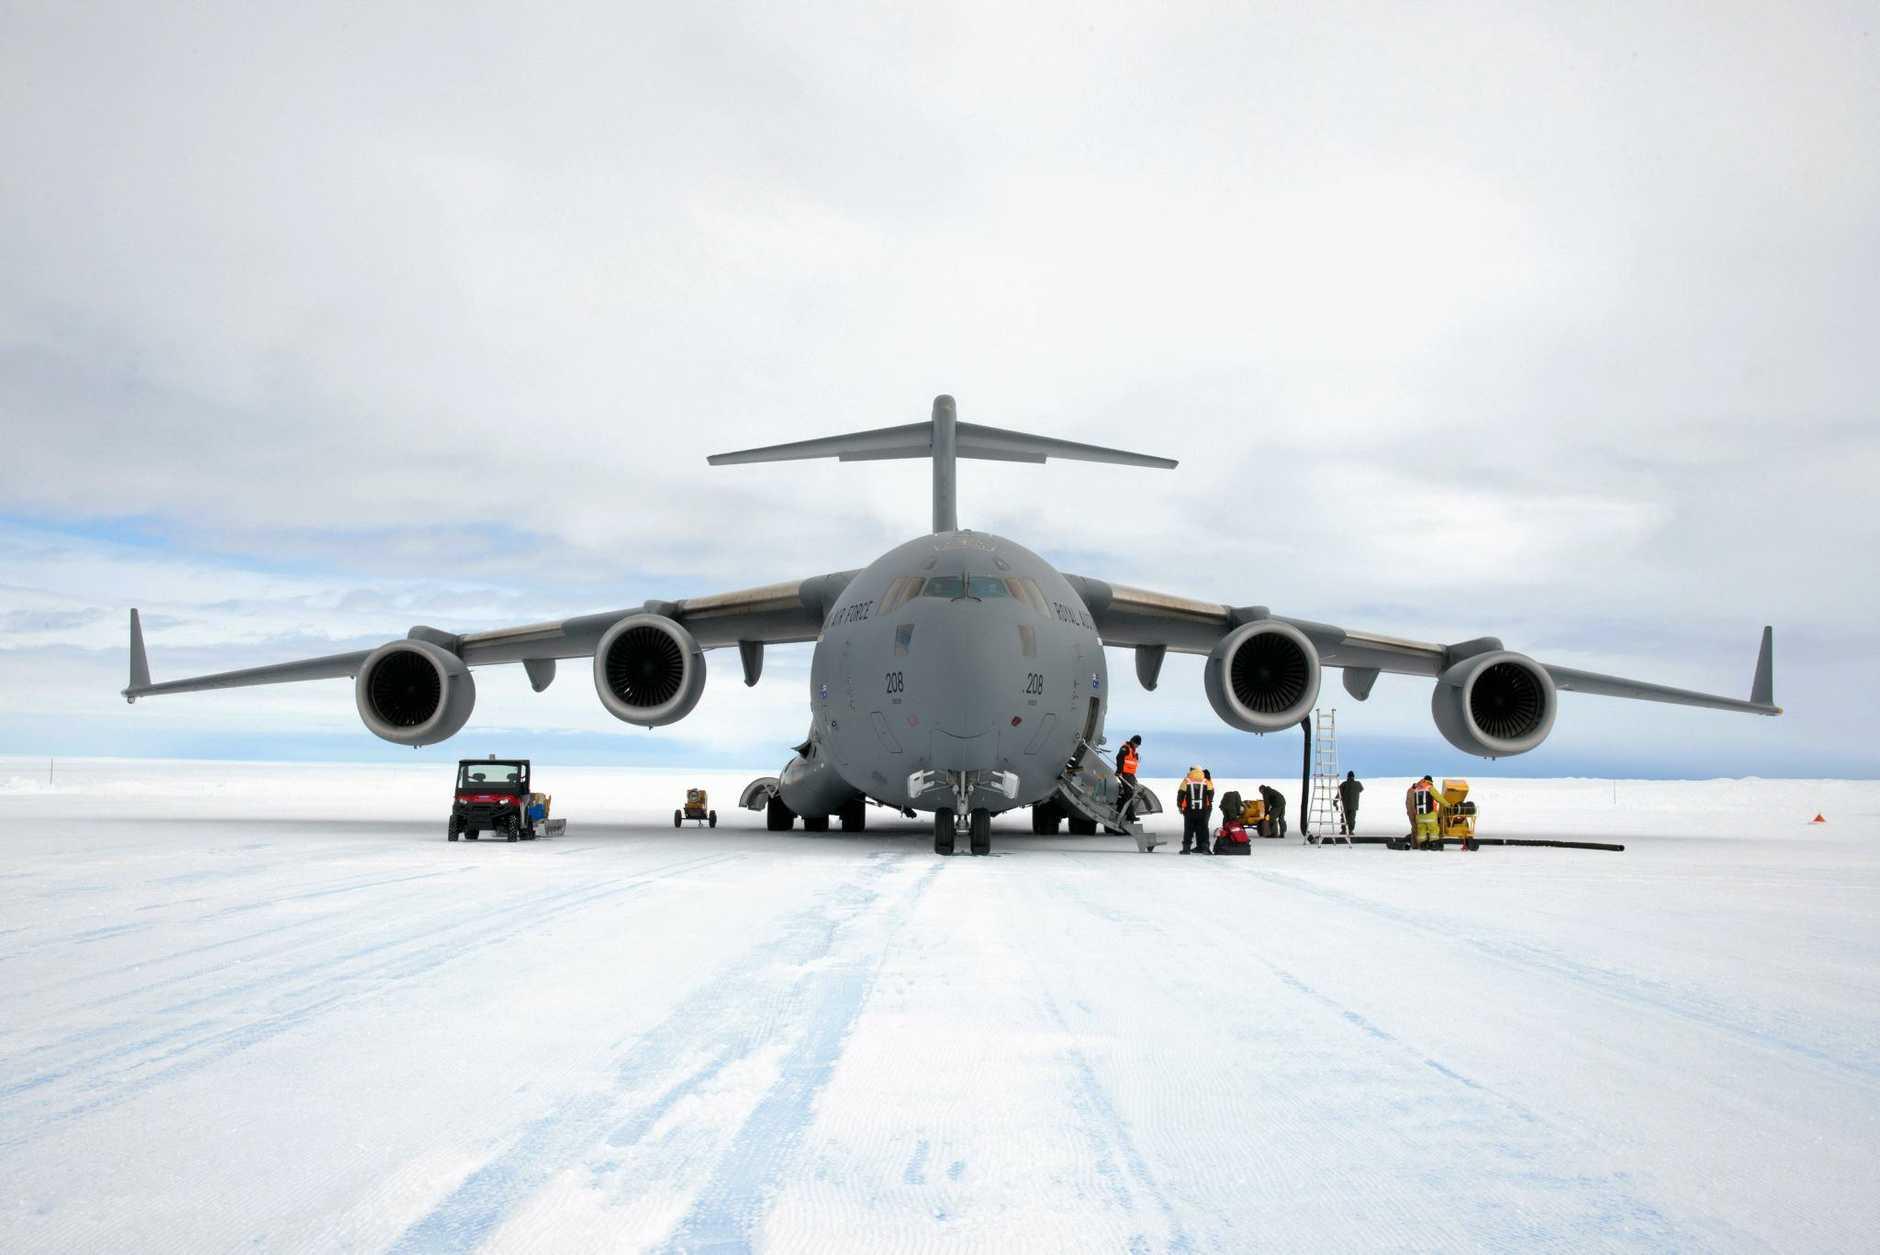 Unloading cargo from C-17A Globemaster III on Wilkins Runway.